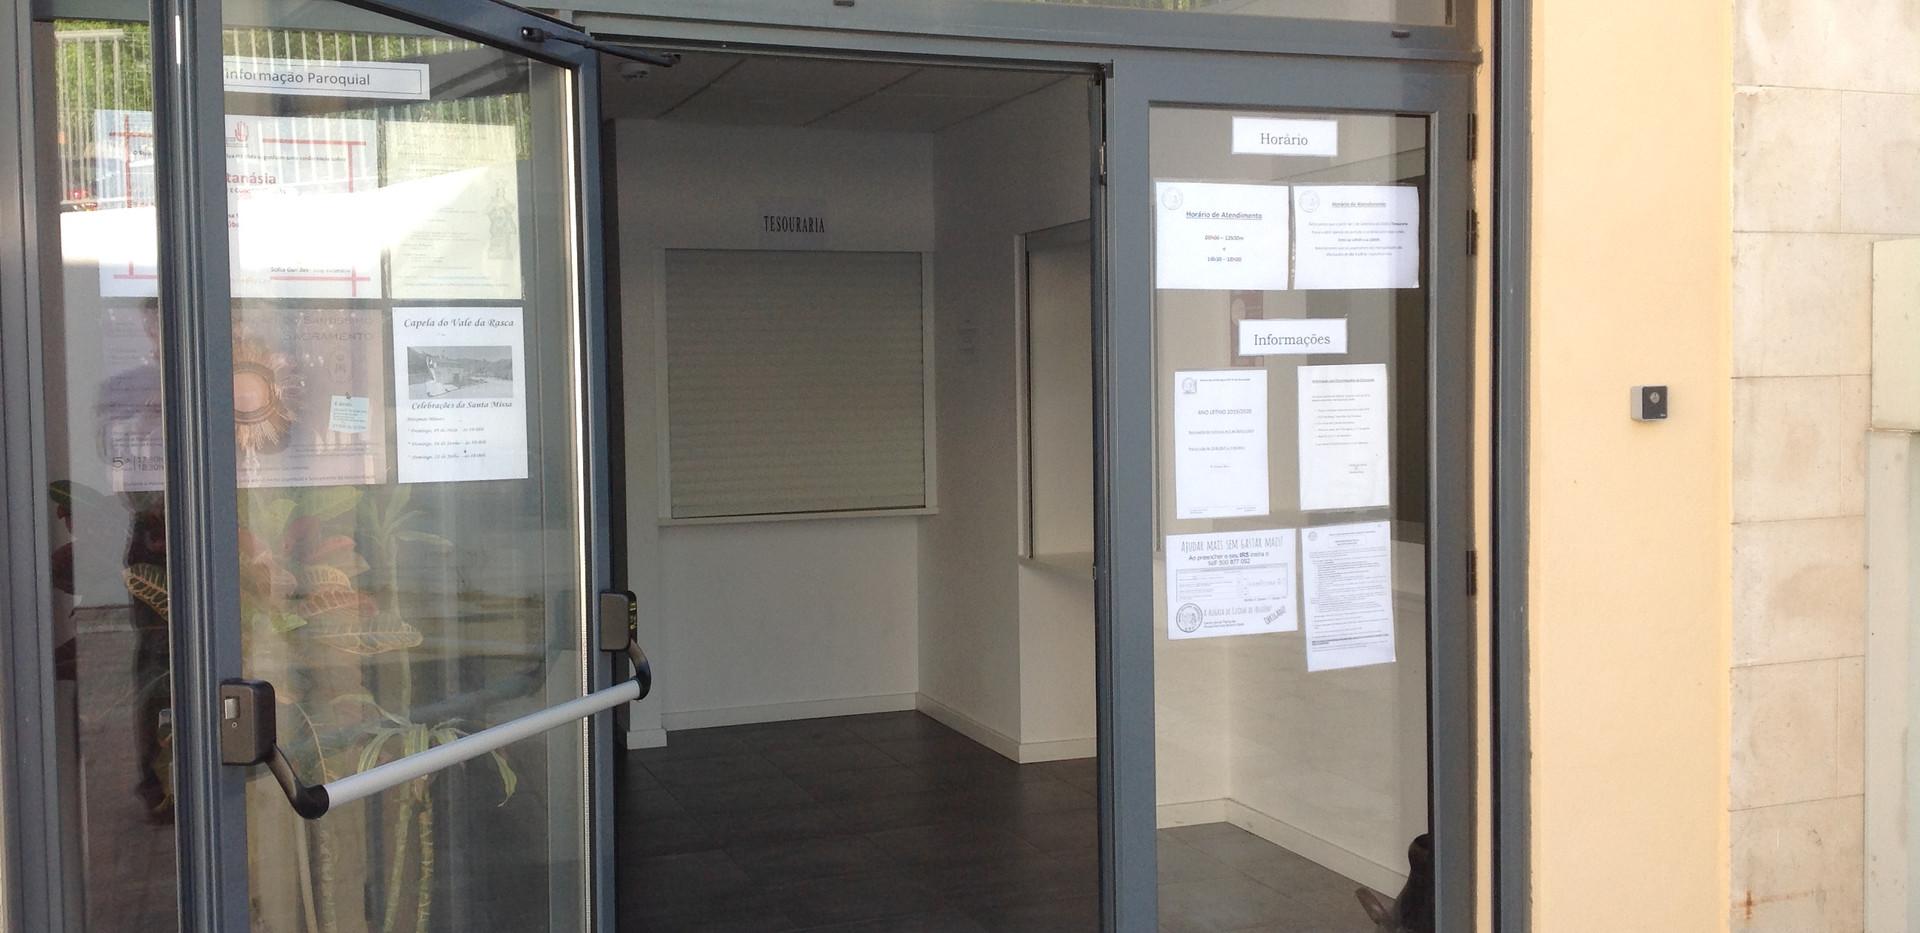 Porta de entrada do Lar